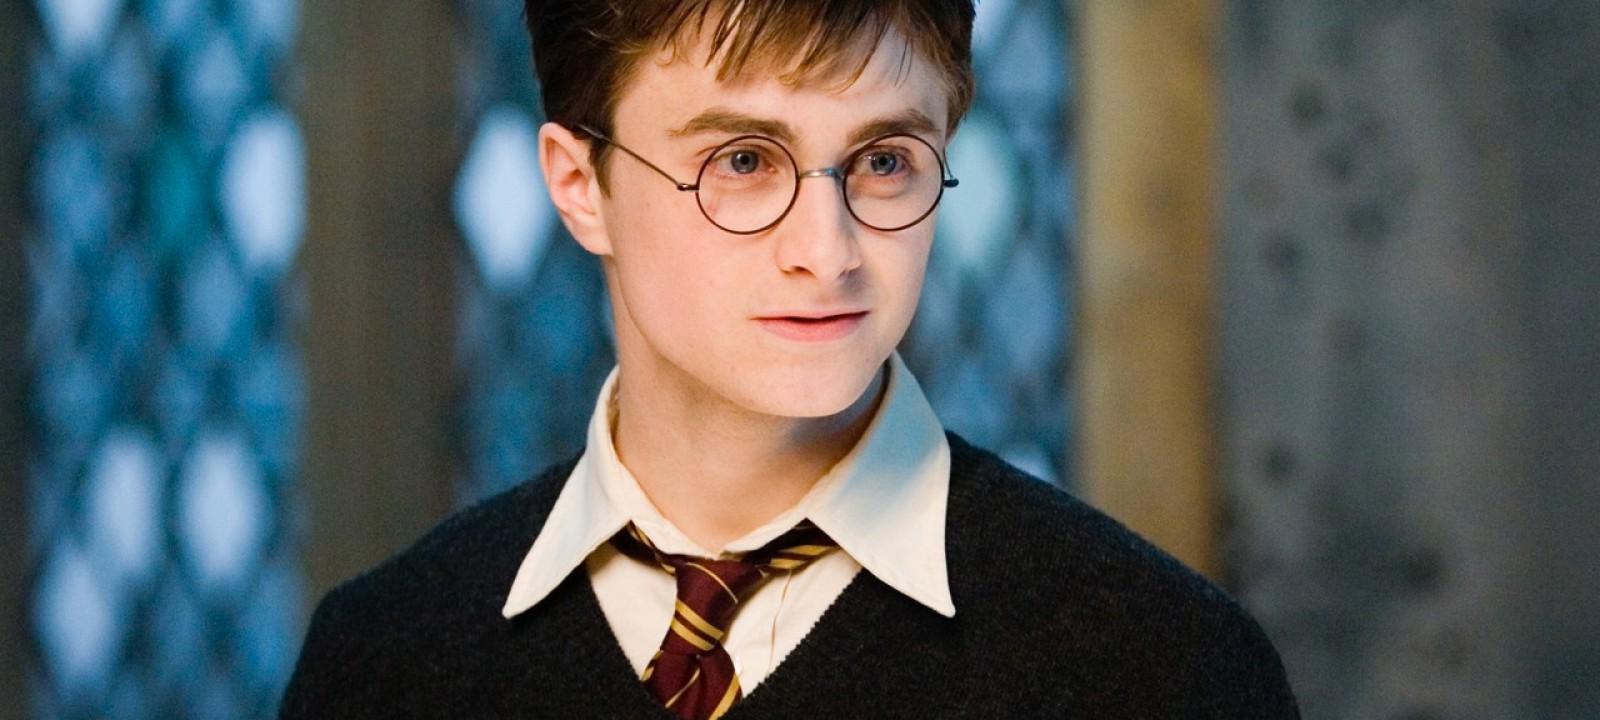 Daniel Radcliffe as Harry Potter (Photo: Warner Bros)